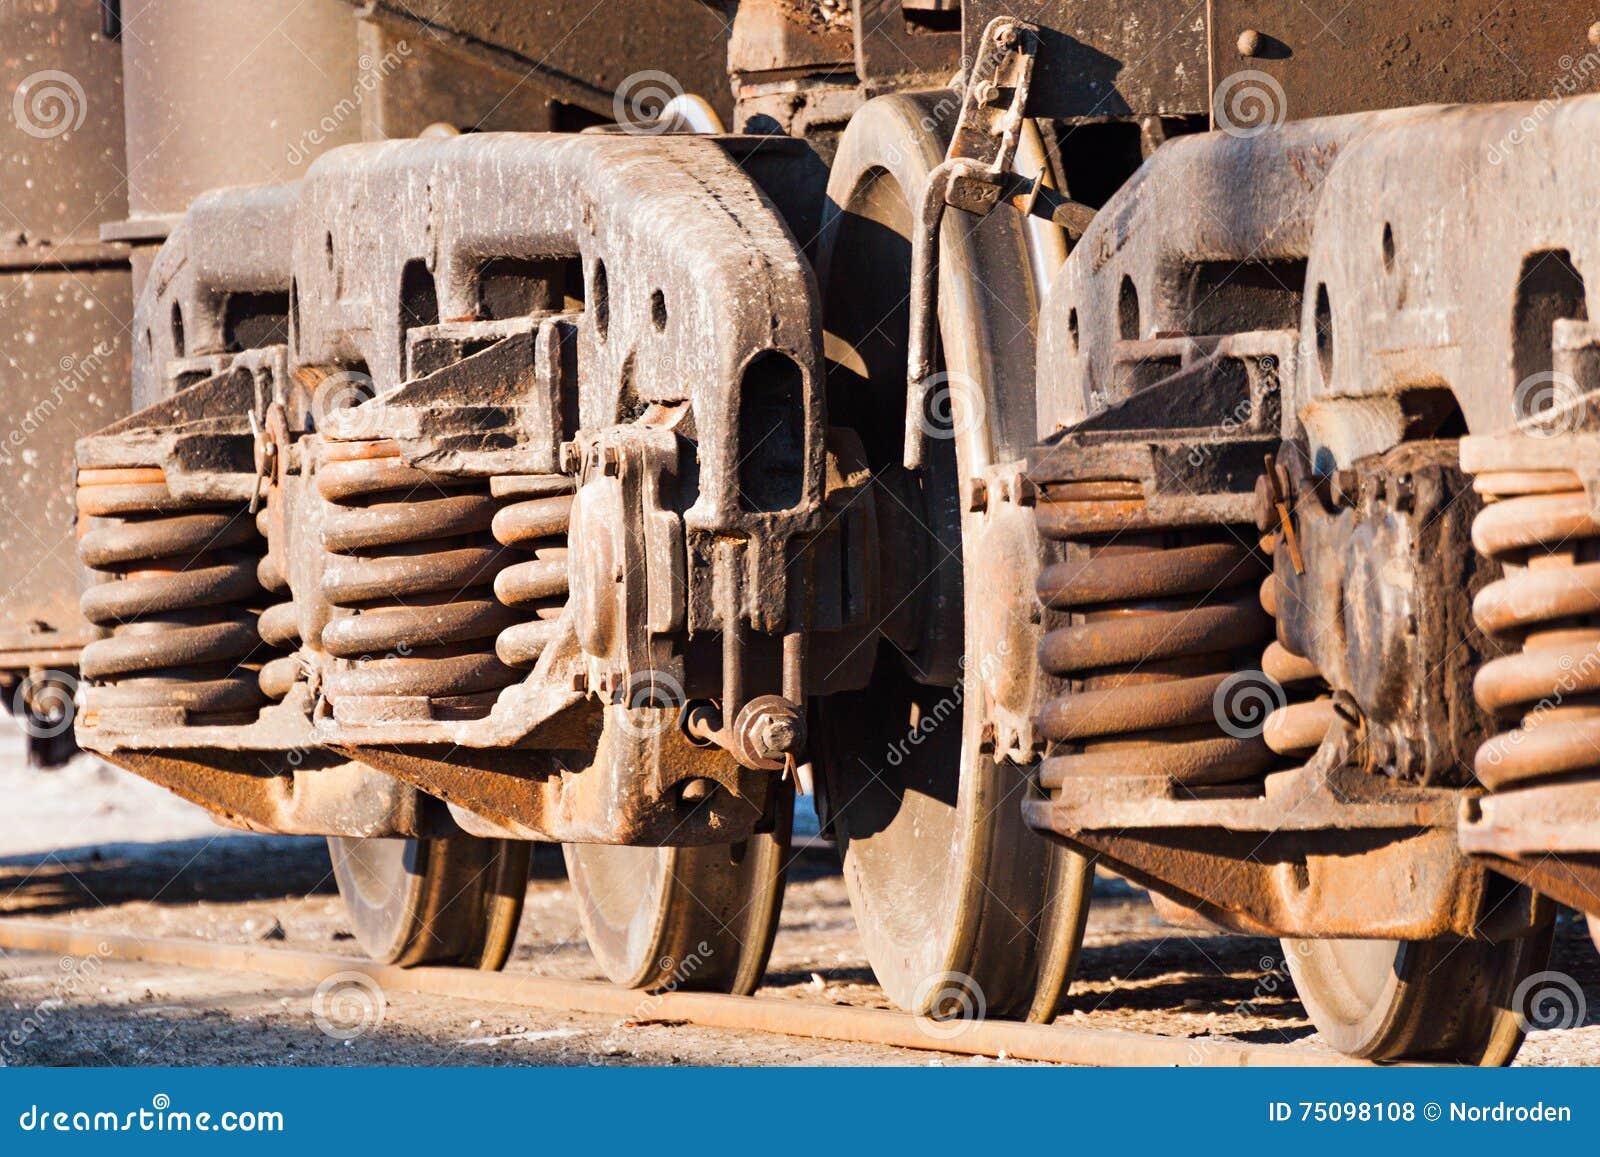 Wheels And Wheel Trolley Heavy Railway Freight Car  Stock